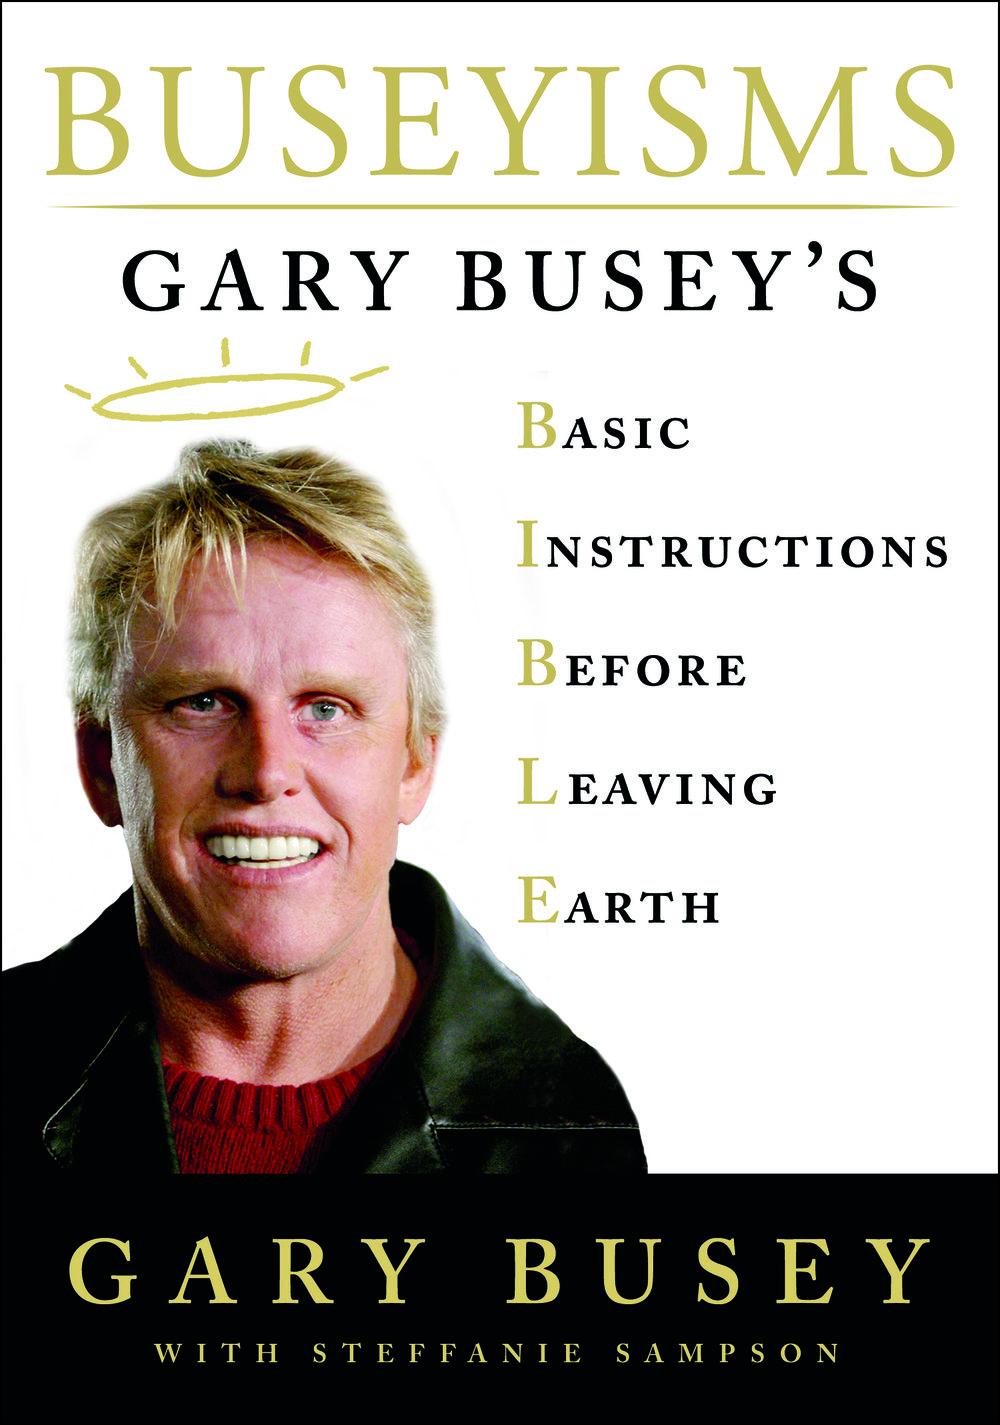 Buseyisms_Gary_Busey.JPG